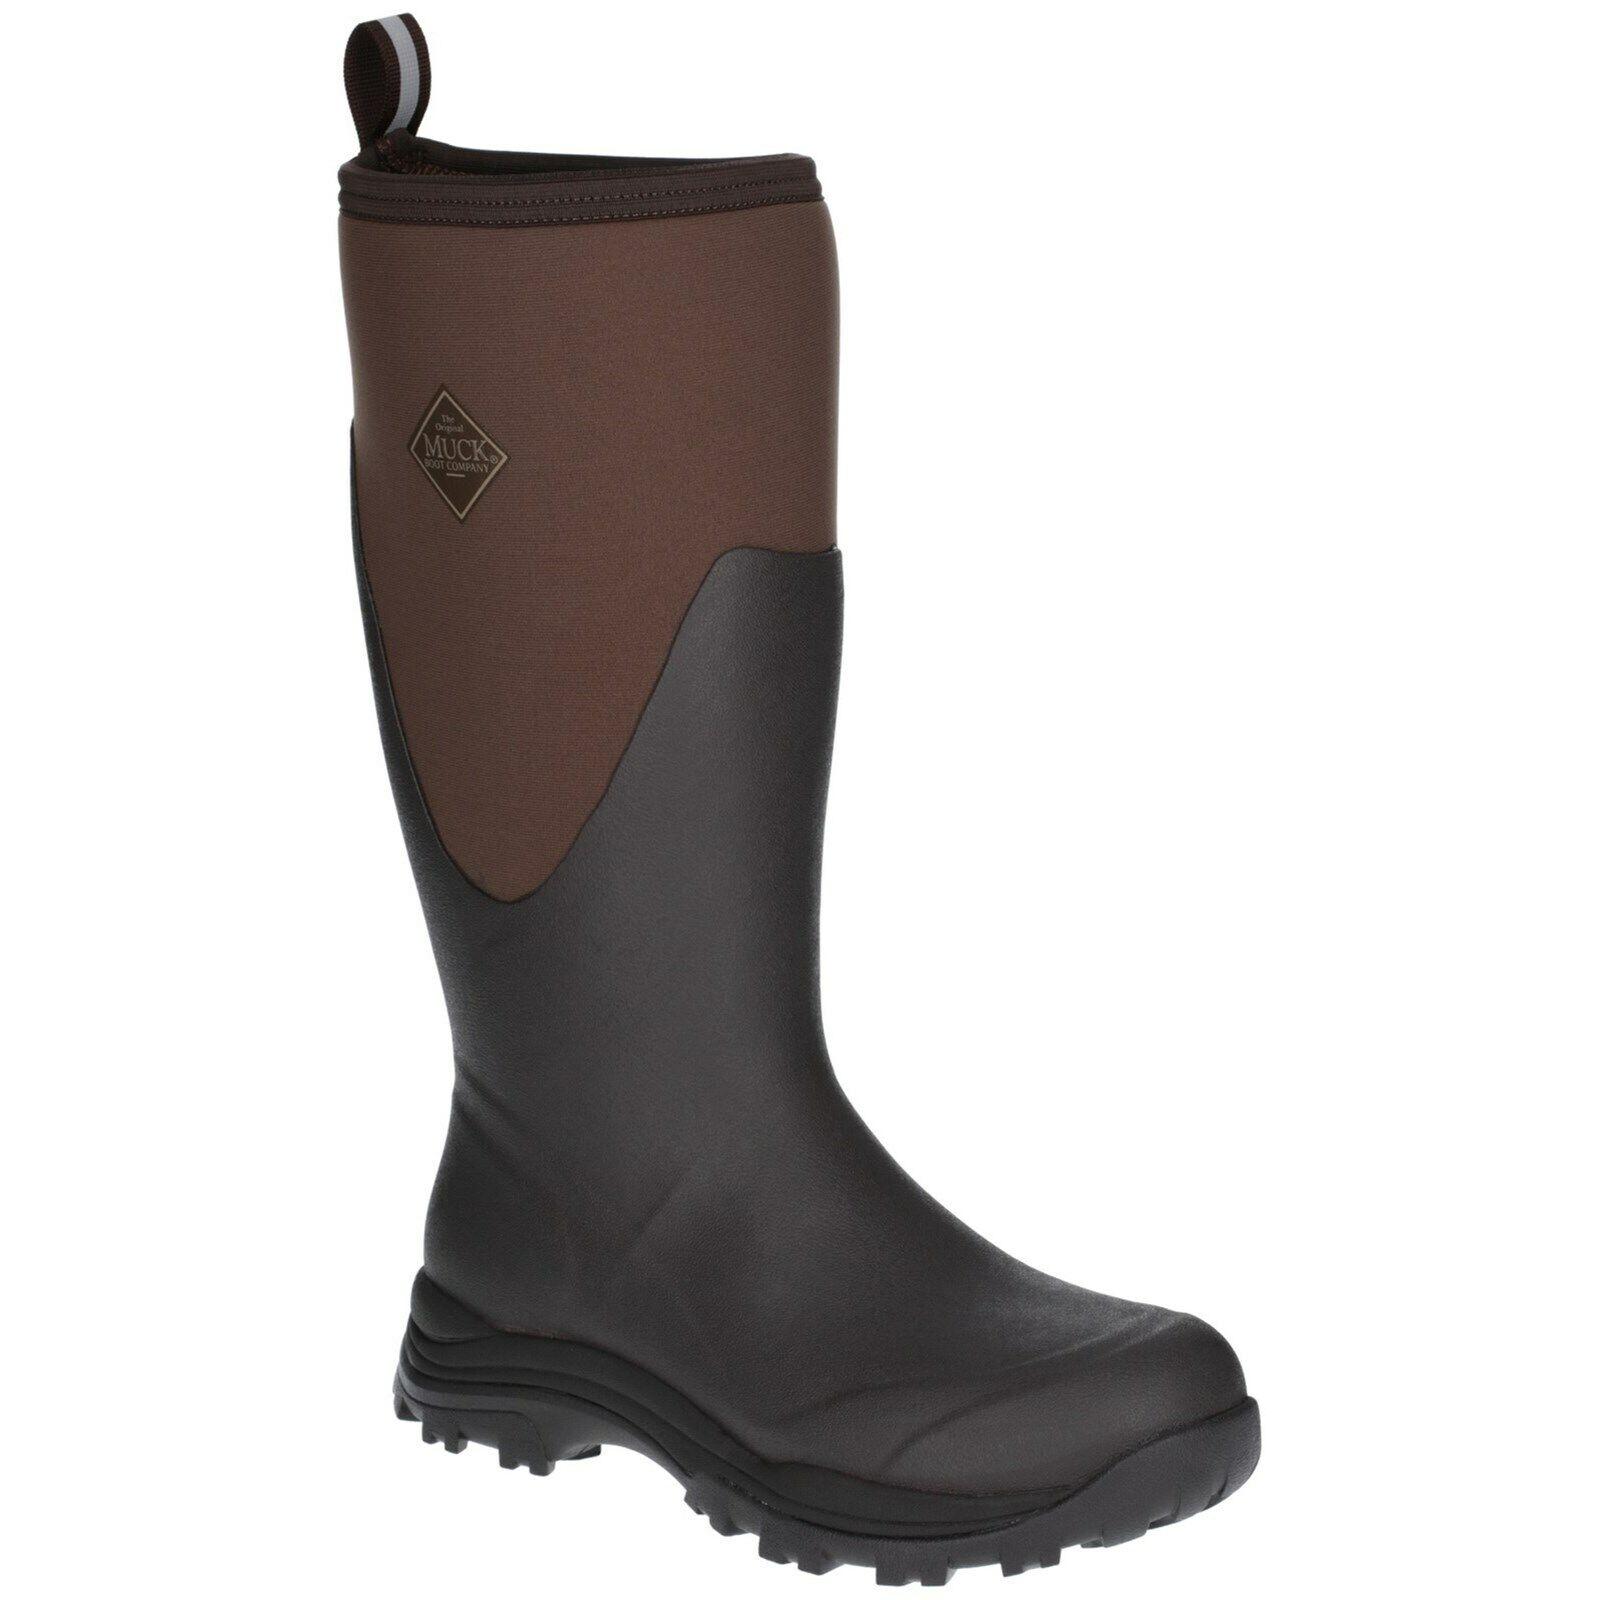 Muck boots outpost man wellies high waterproof outdoor